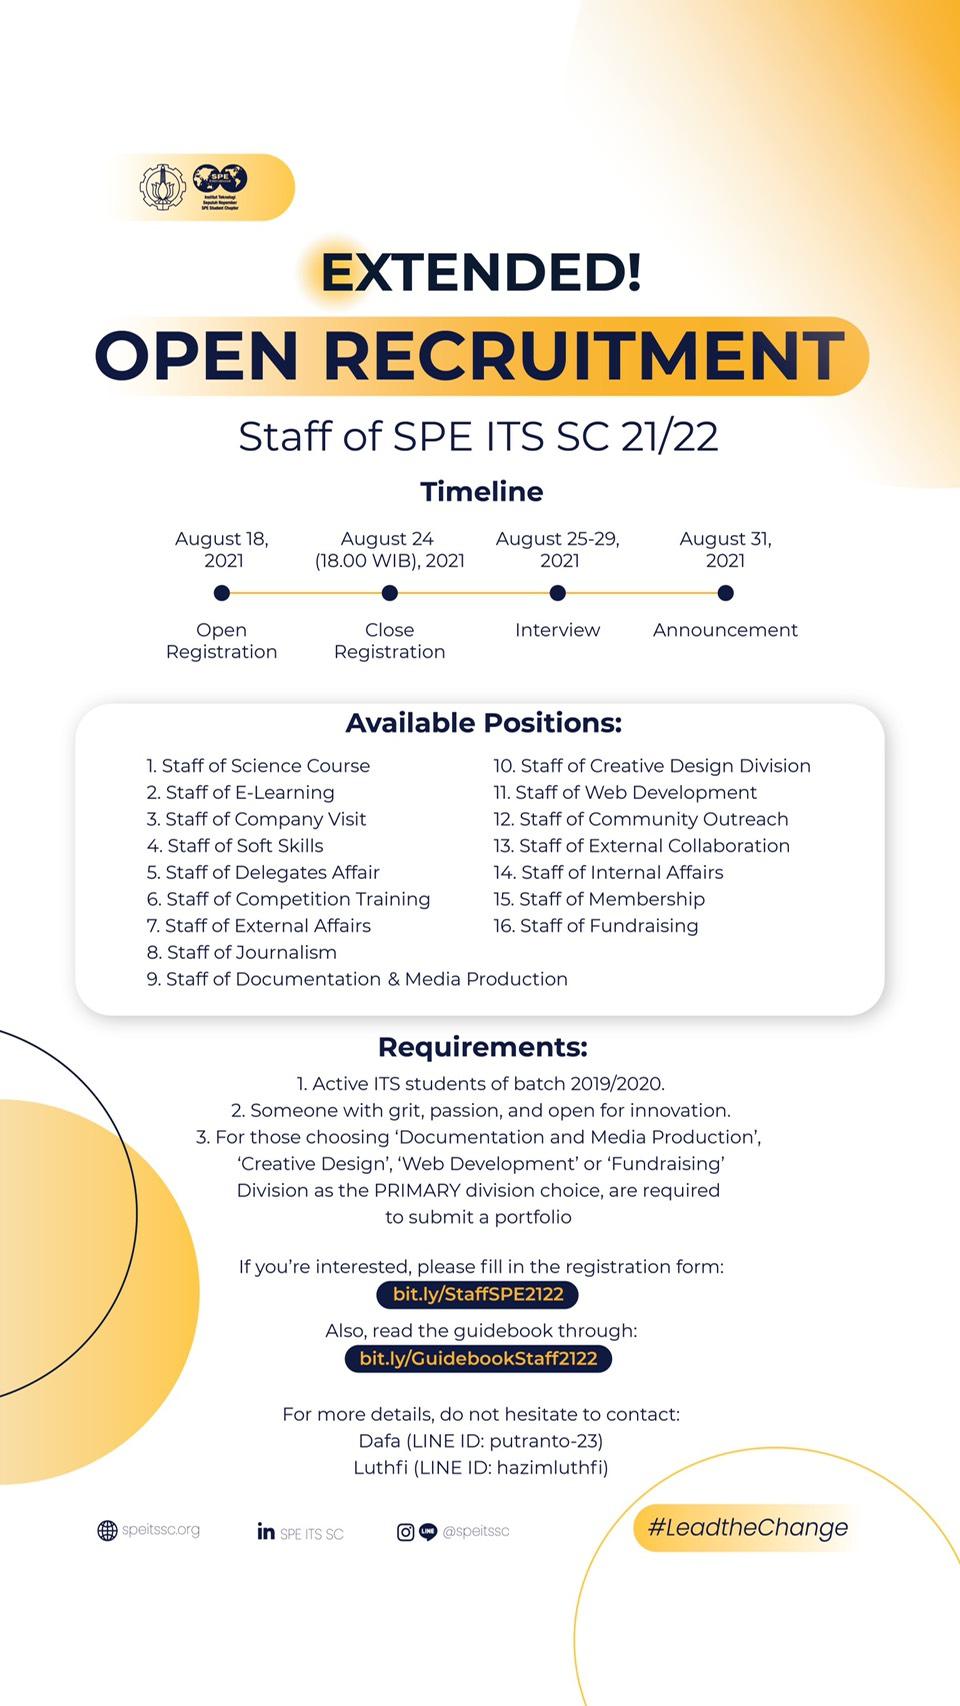 [SPE ITS SC 21/22 Staff Recruitment]